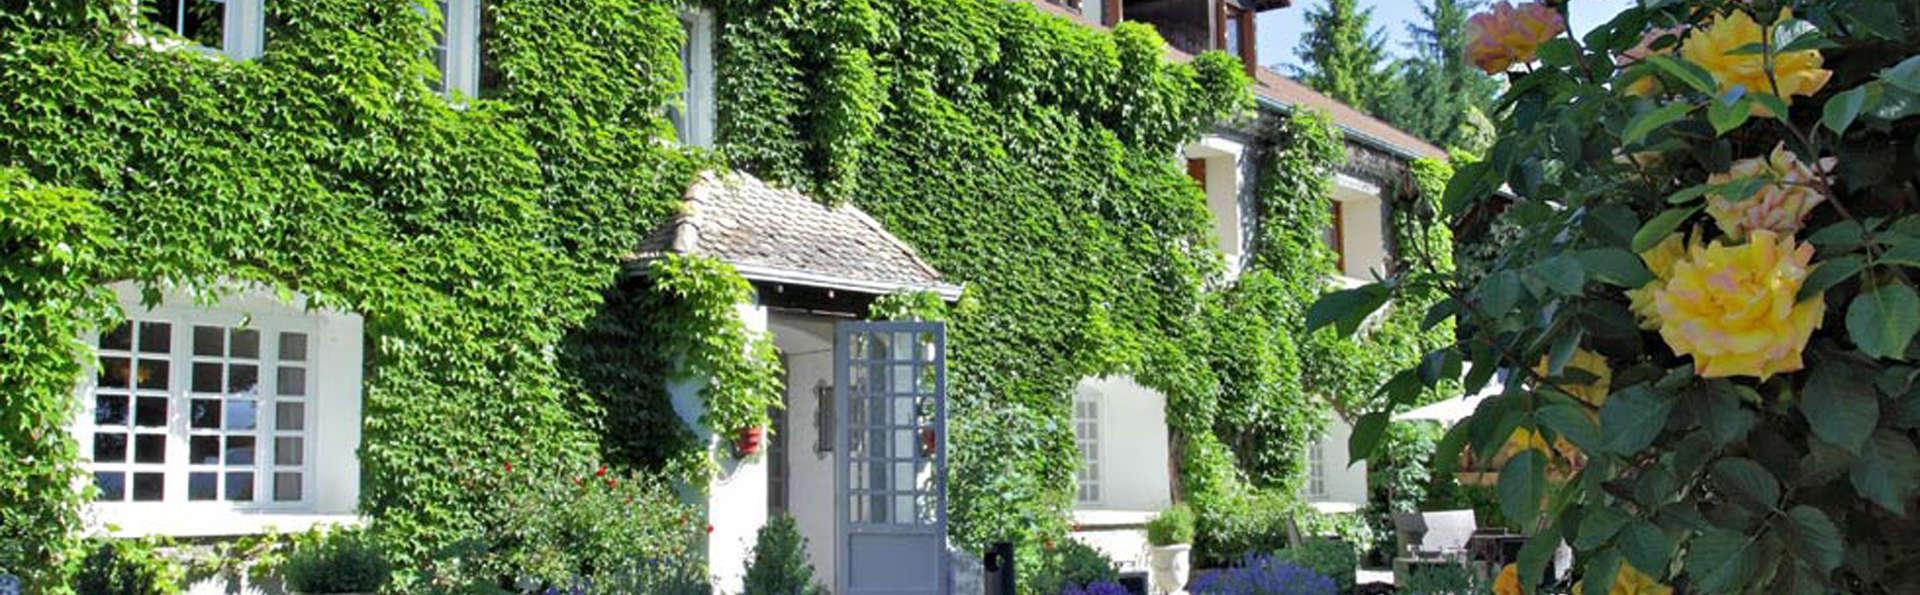 H tel les olivades h tel de charme gap for Hotel de charme paca